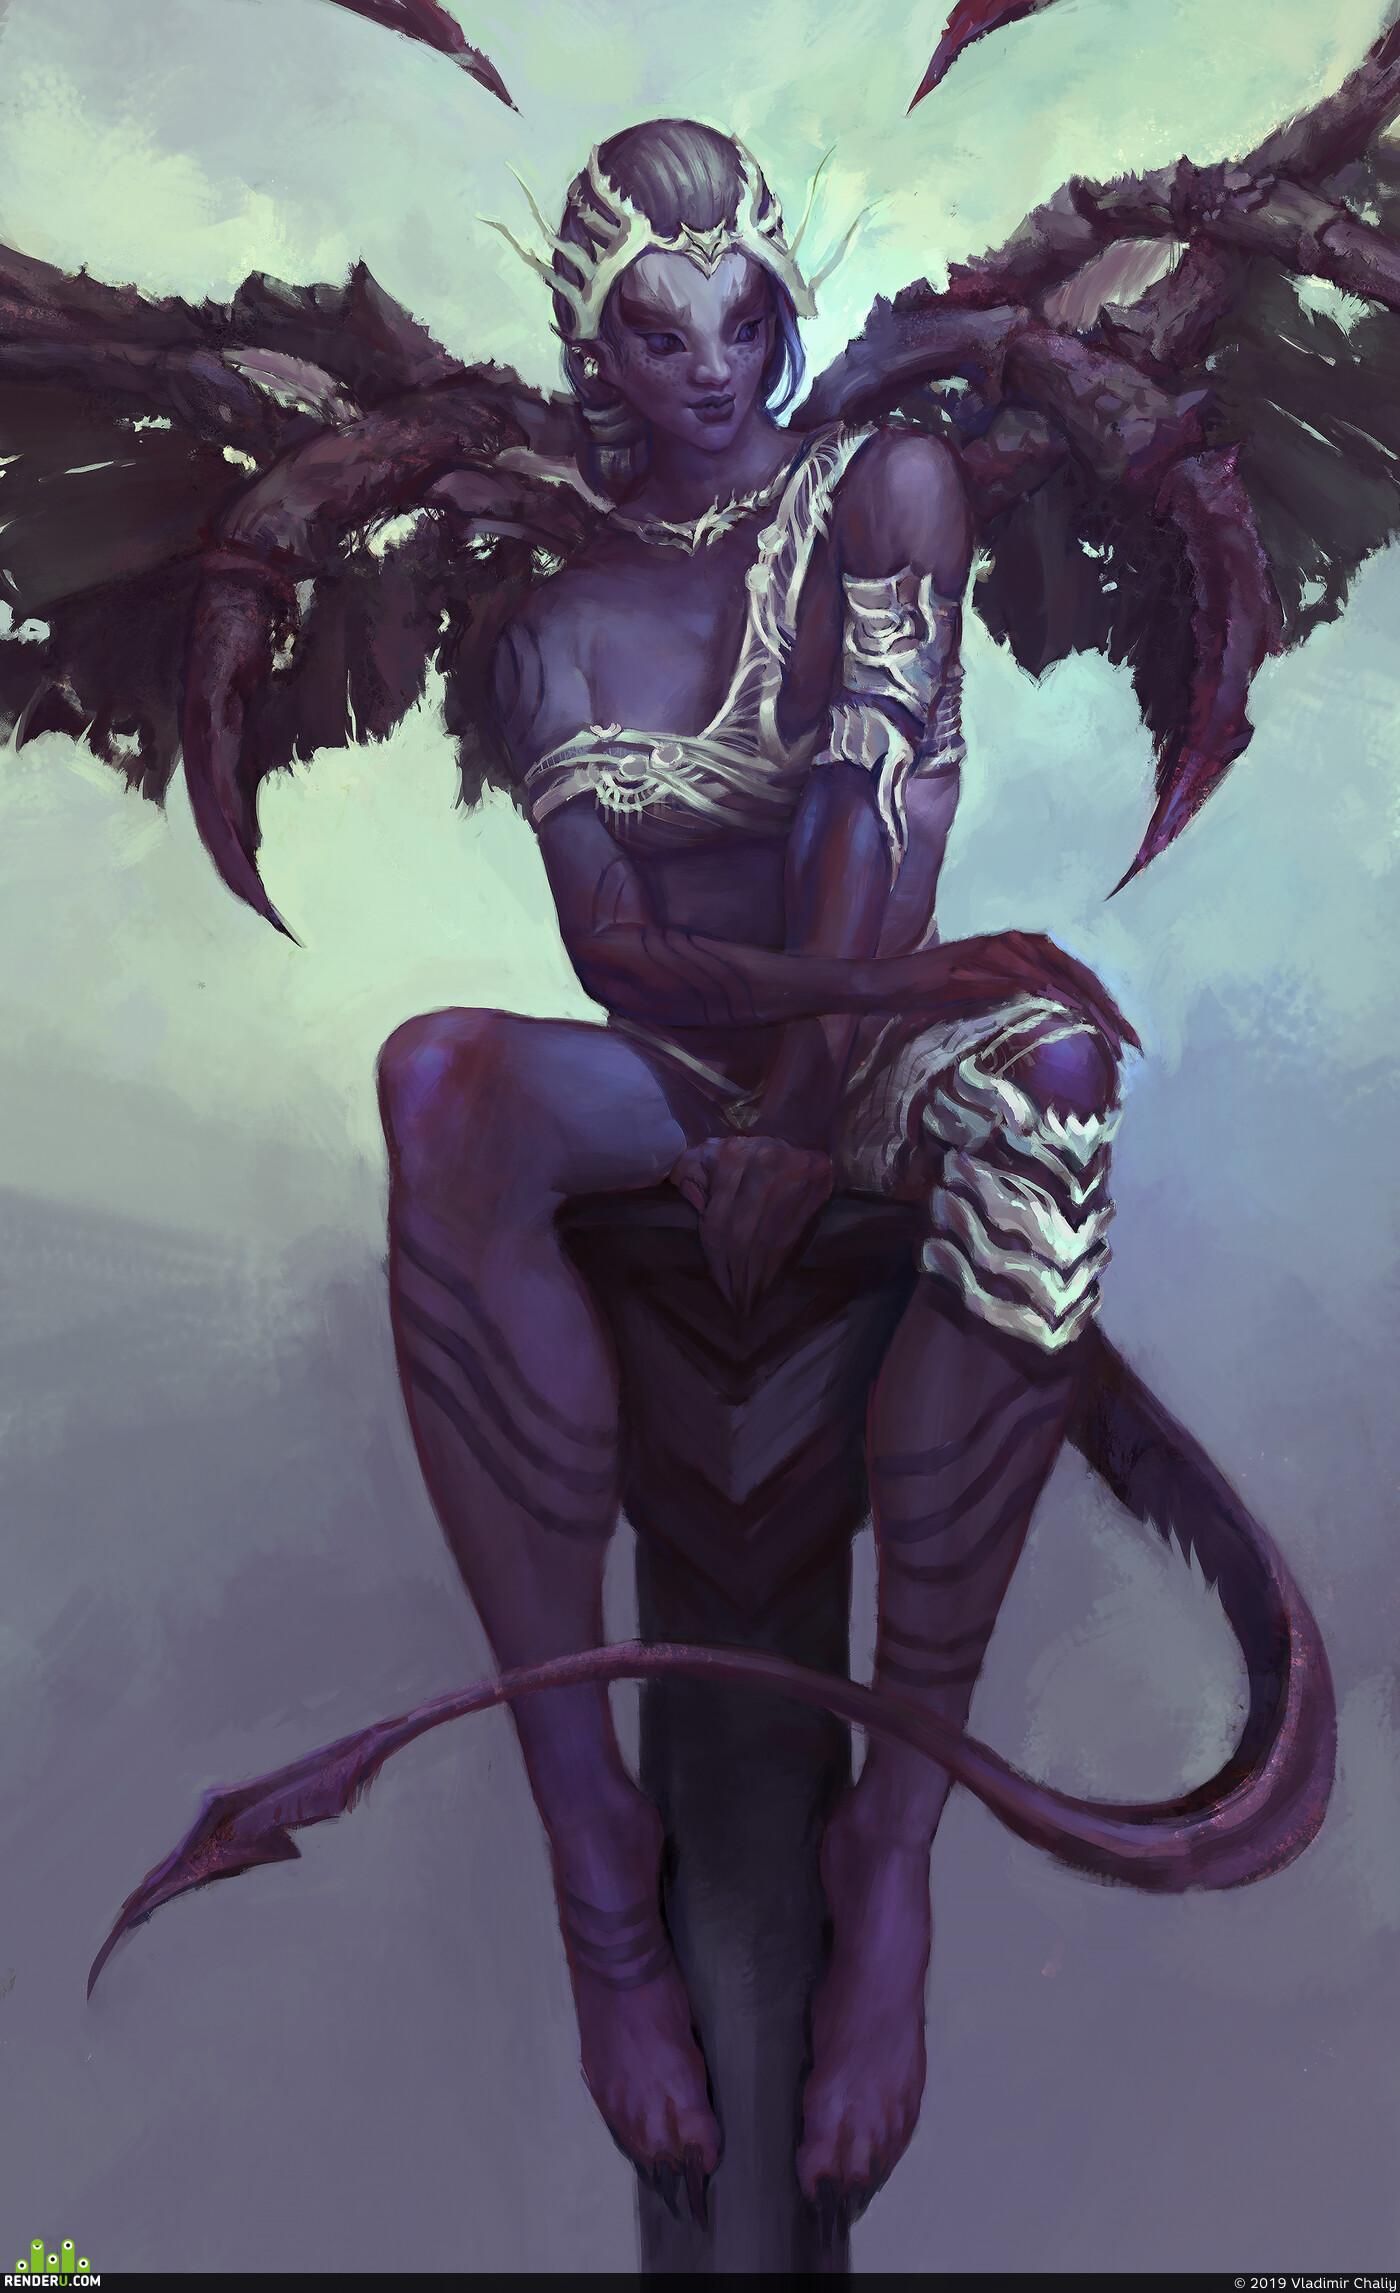 Characters, 2д арт, характер, концепт, ведьма